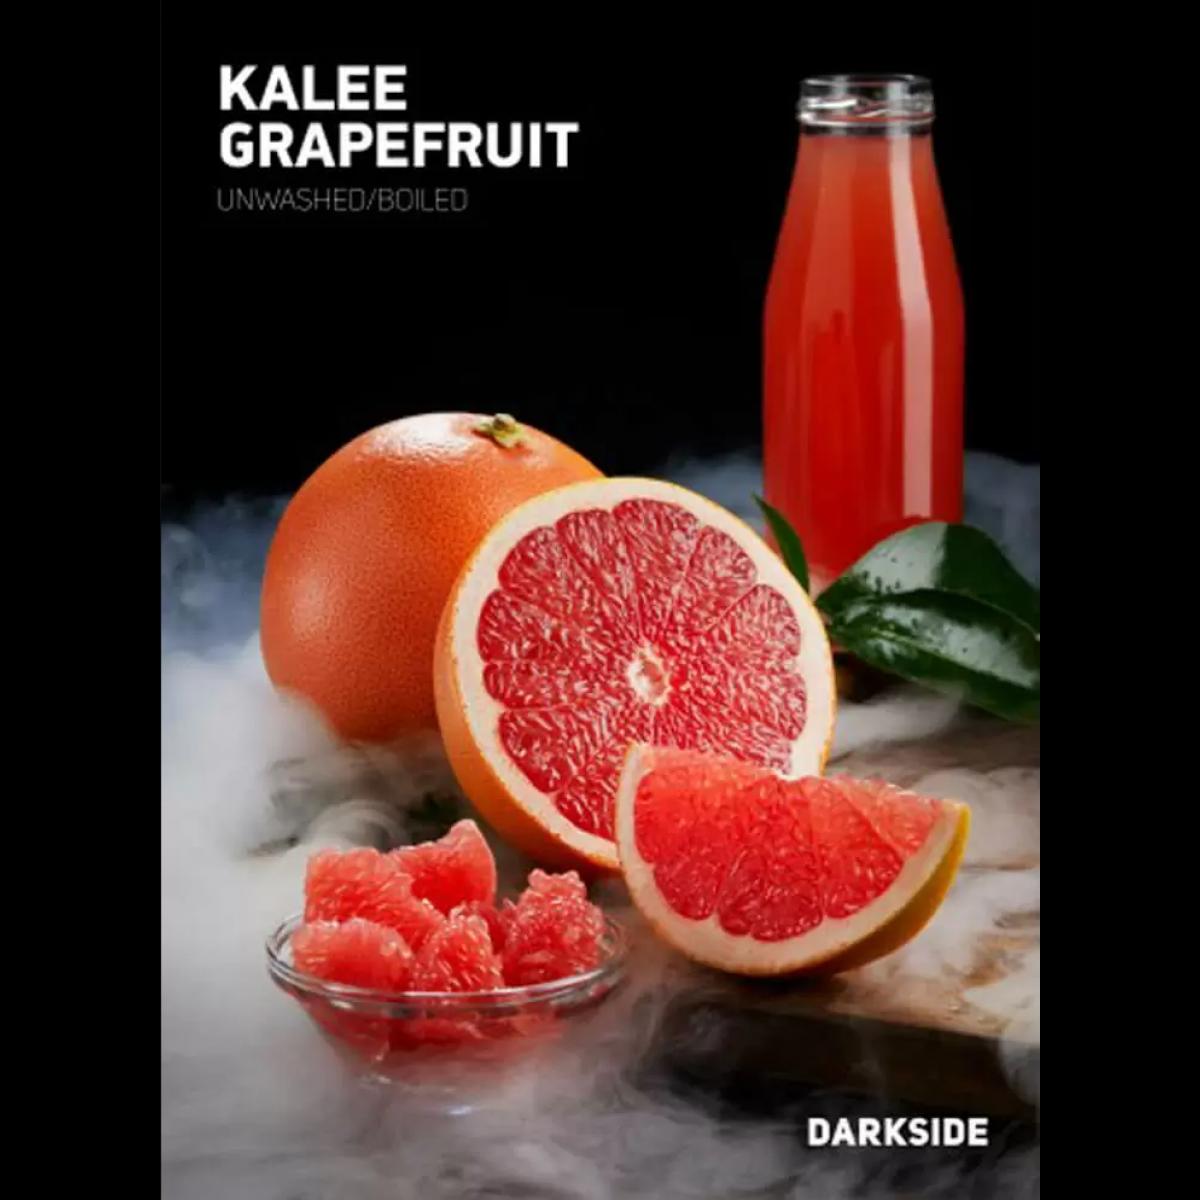 Табак Dark Side Kalee Grapefruit (Дарксайд Грейпфрут) medium 100 г.